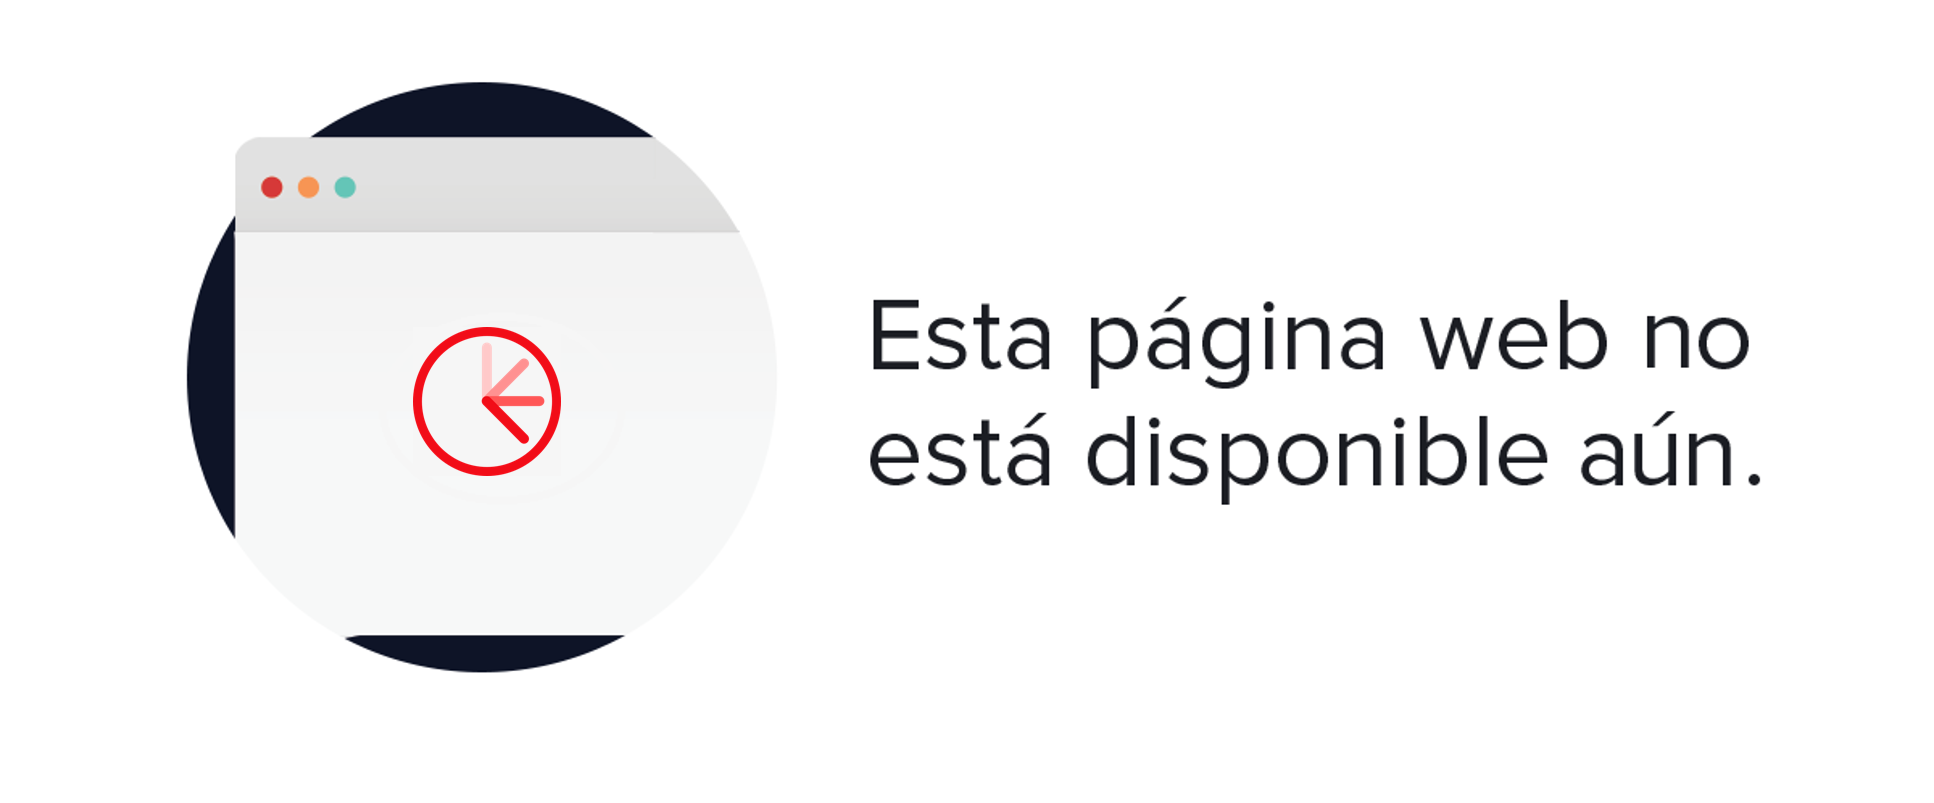 Easy Wear - Pantalón ancho de mujer Easy Wear de terciopelo Negro 001041565400987001 - NOXQGZD